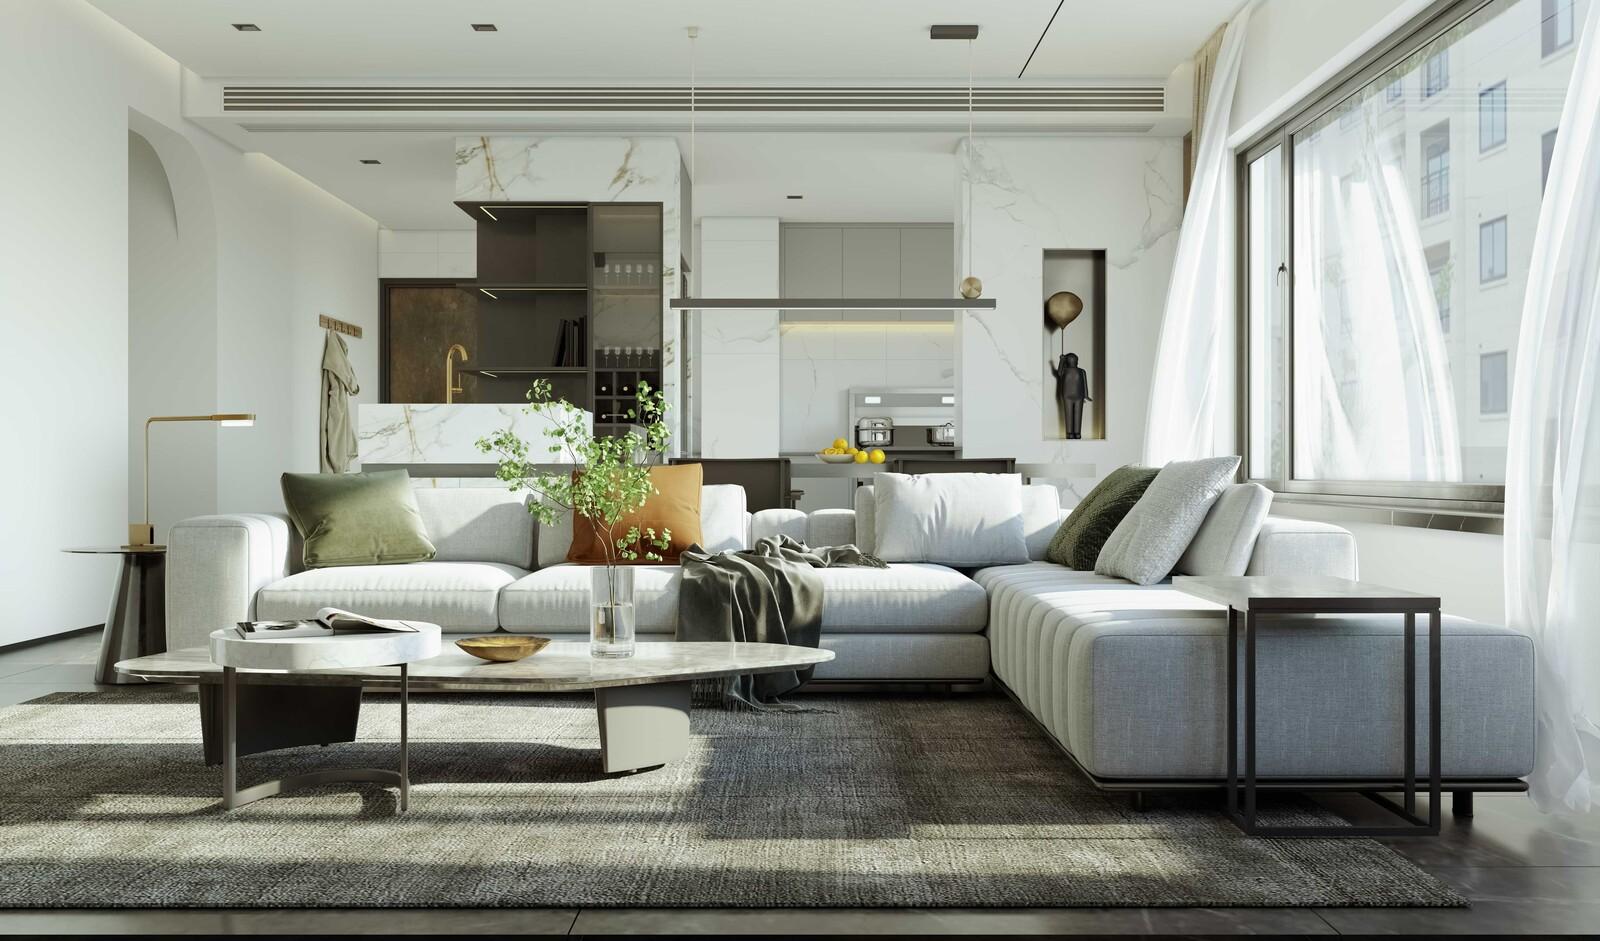 Living Room Afternoon Light Study